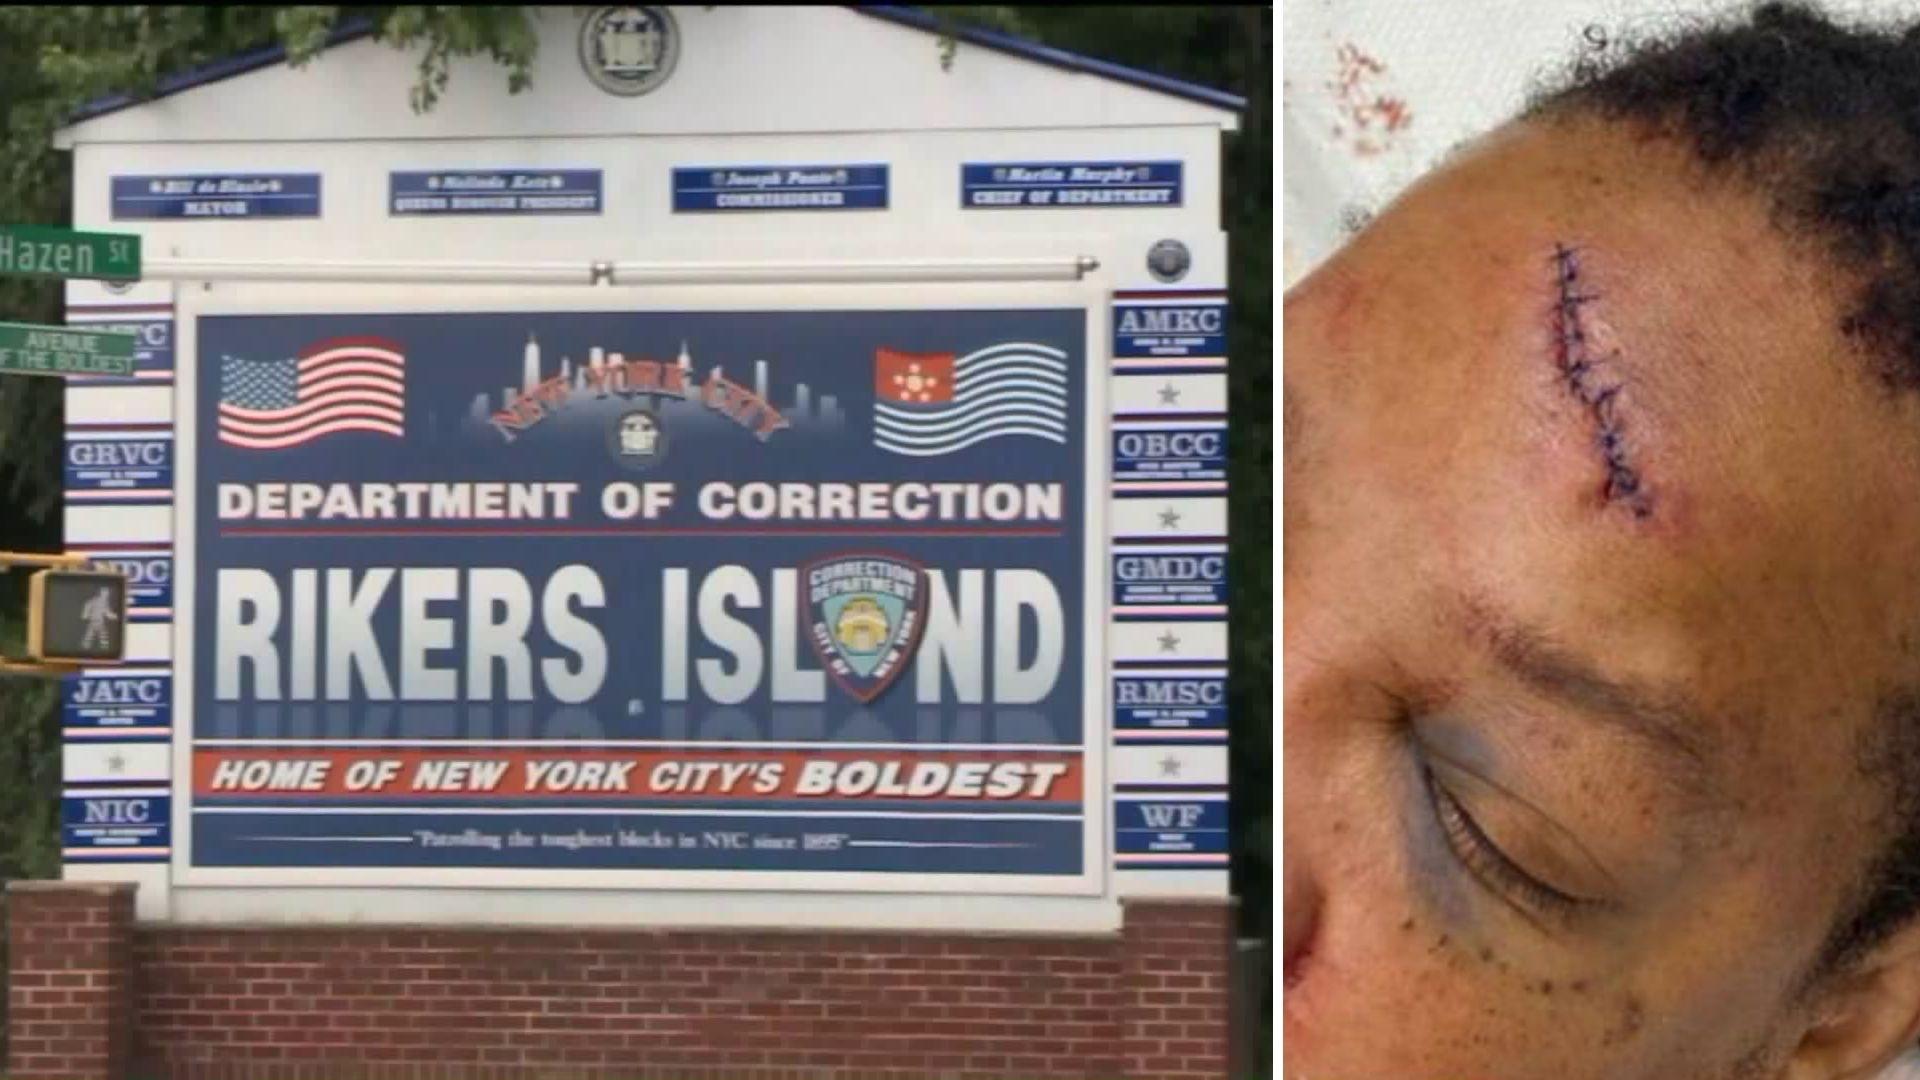 Inmate attacks correction officer at Rikers Island jail facility